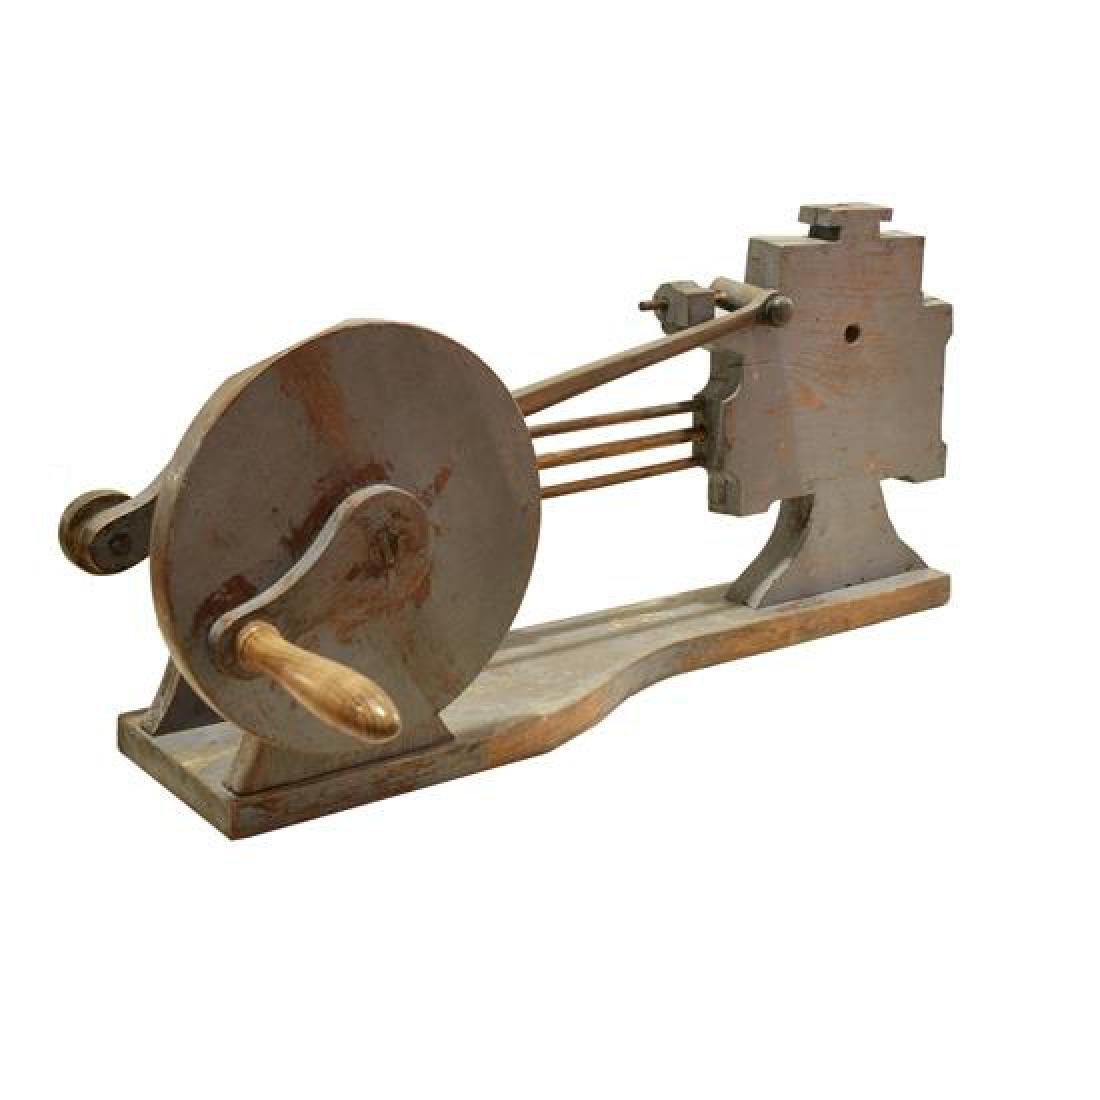 "A Wood Mechanical Teaching Model 28"" W x 14"" D x 12.5"" - 2"